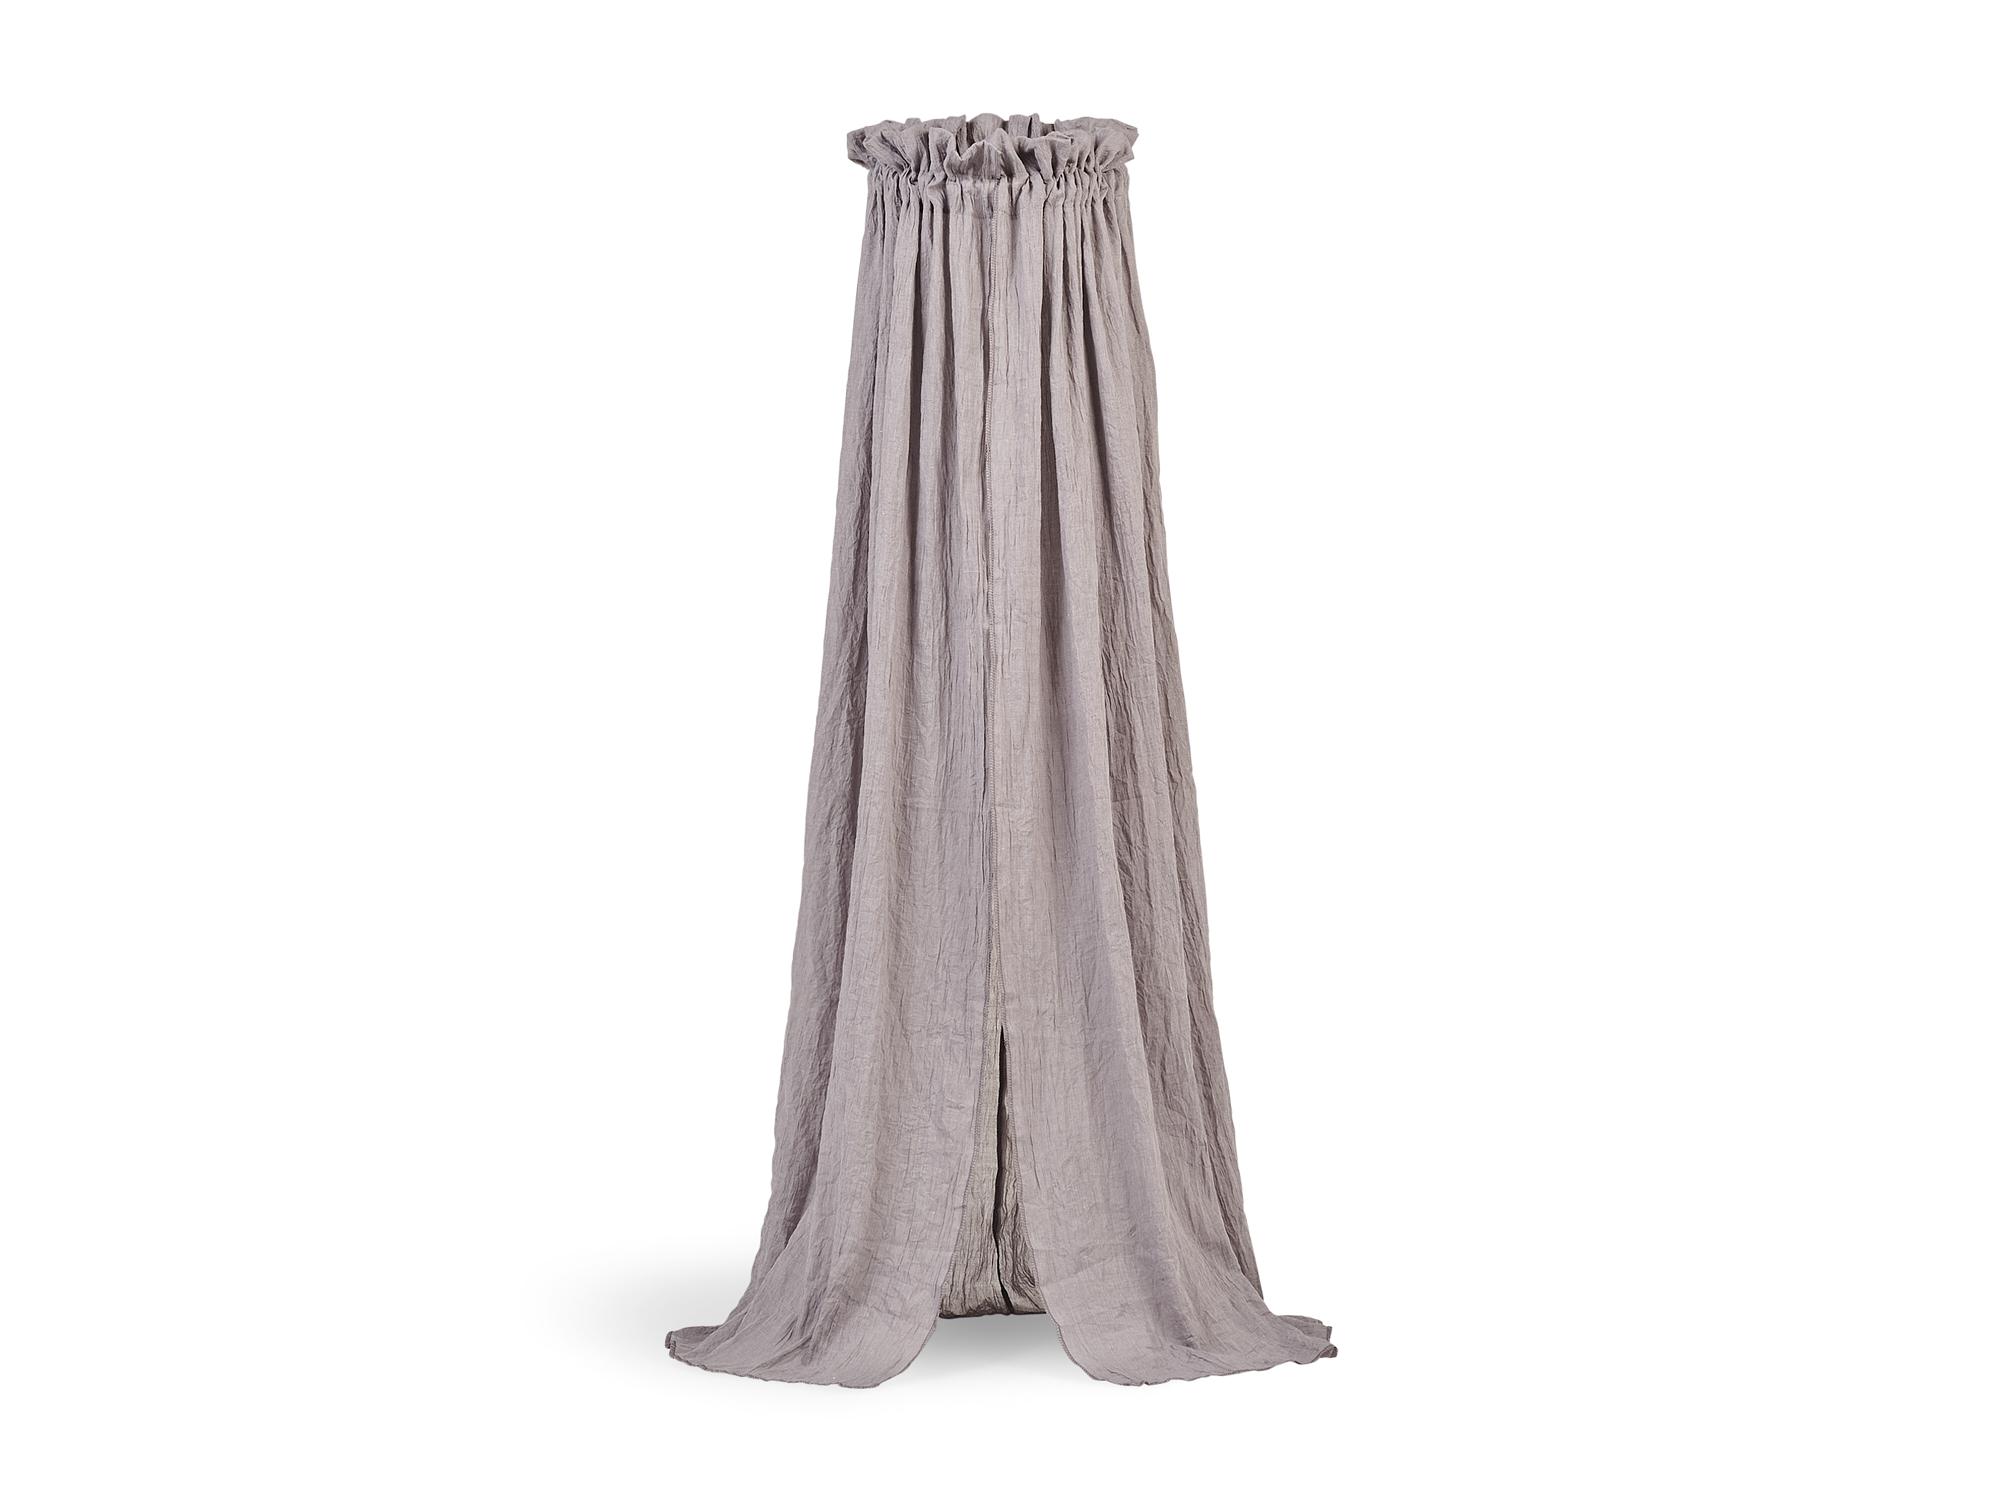 Betthimmel Vintage grau (155 cm)